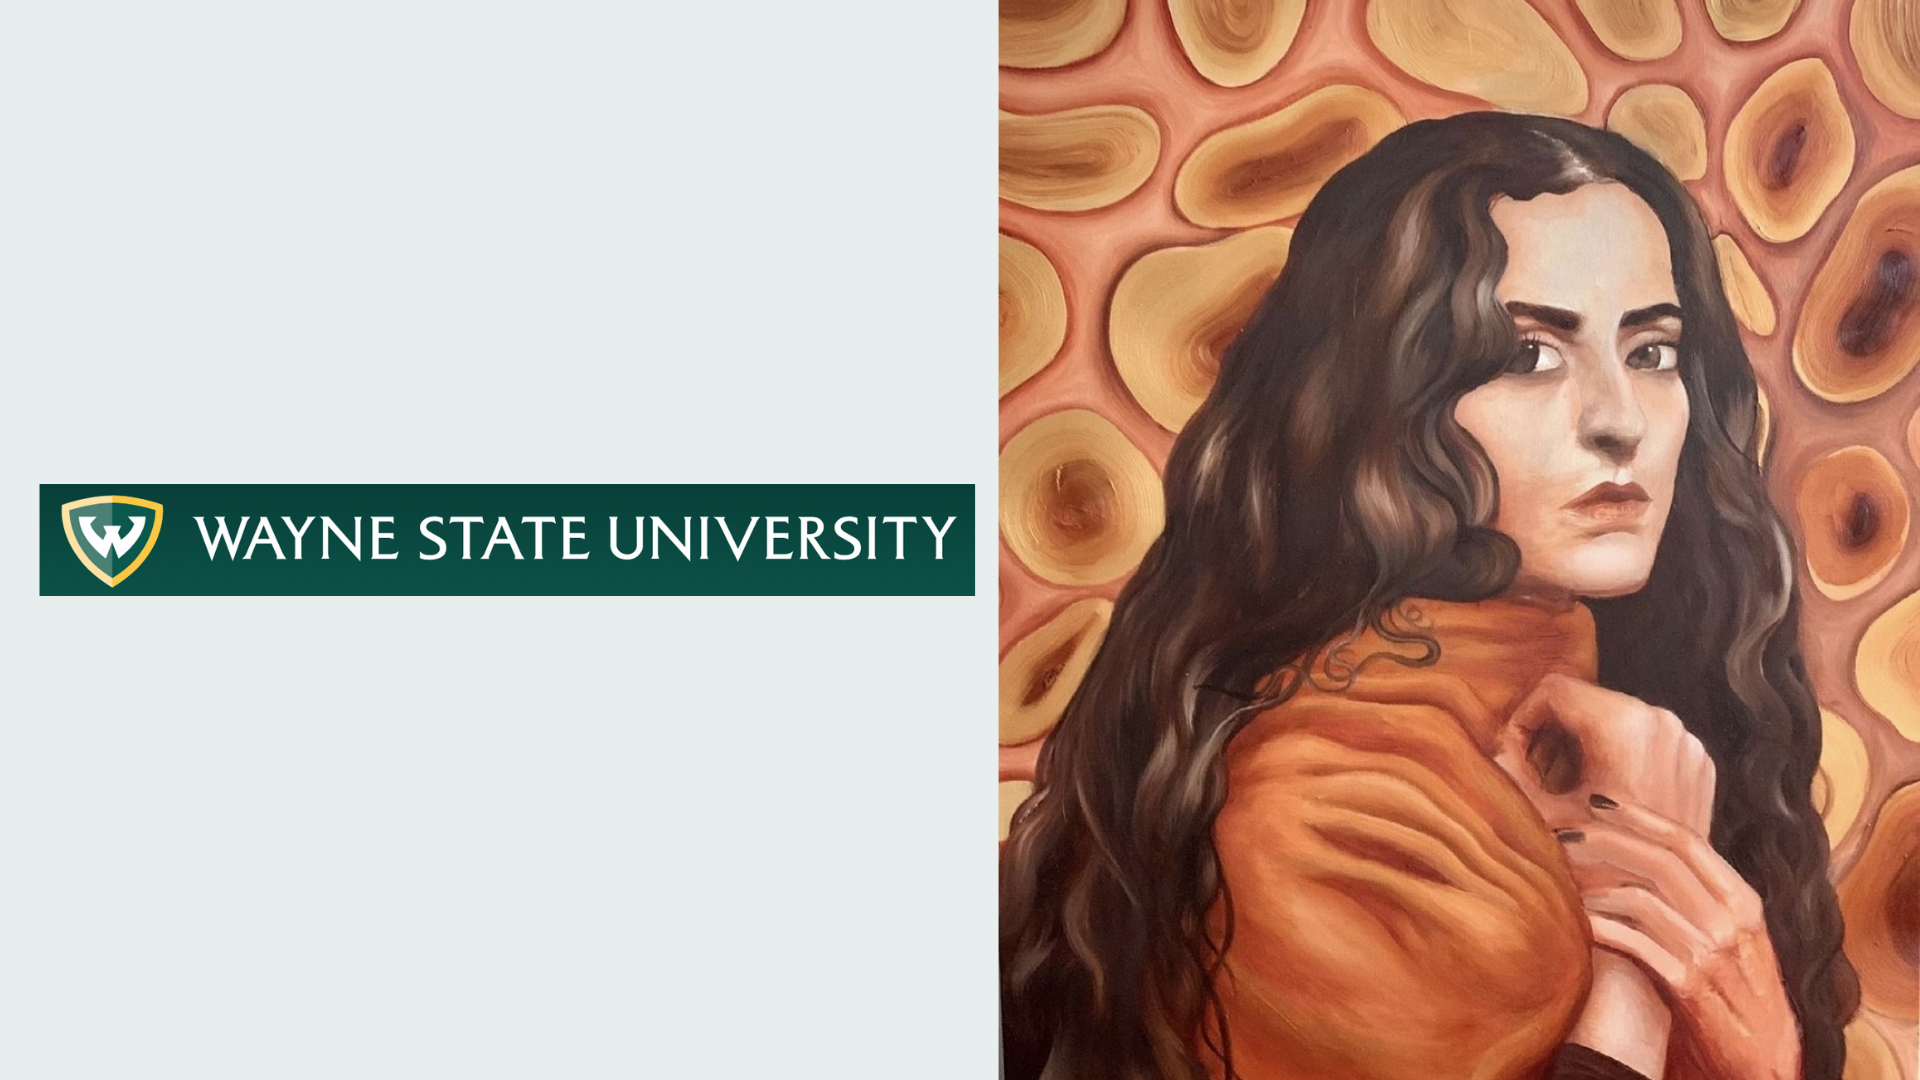 Wayne State University Student Testimonial